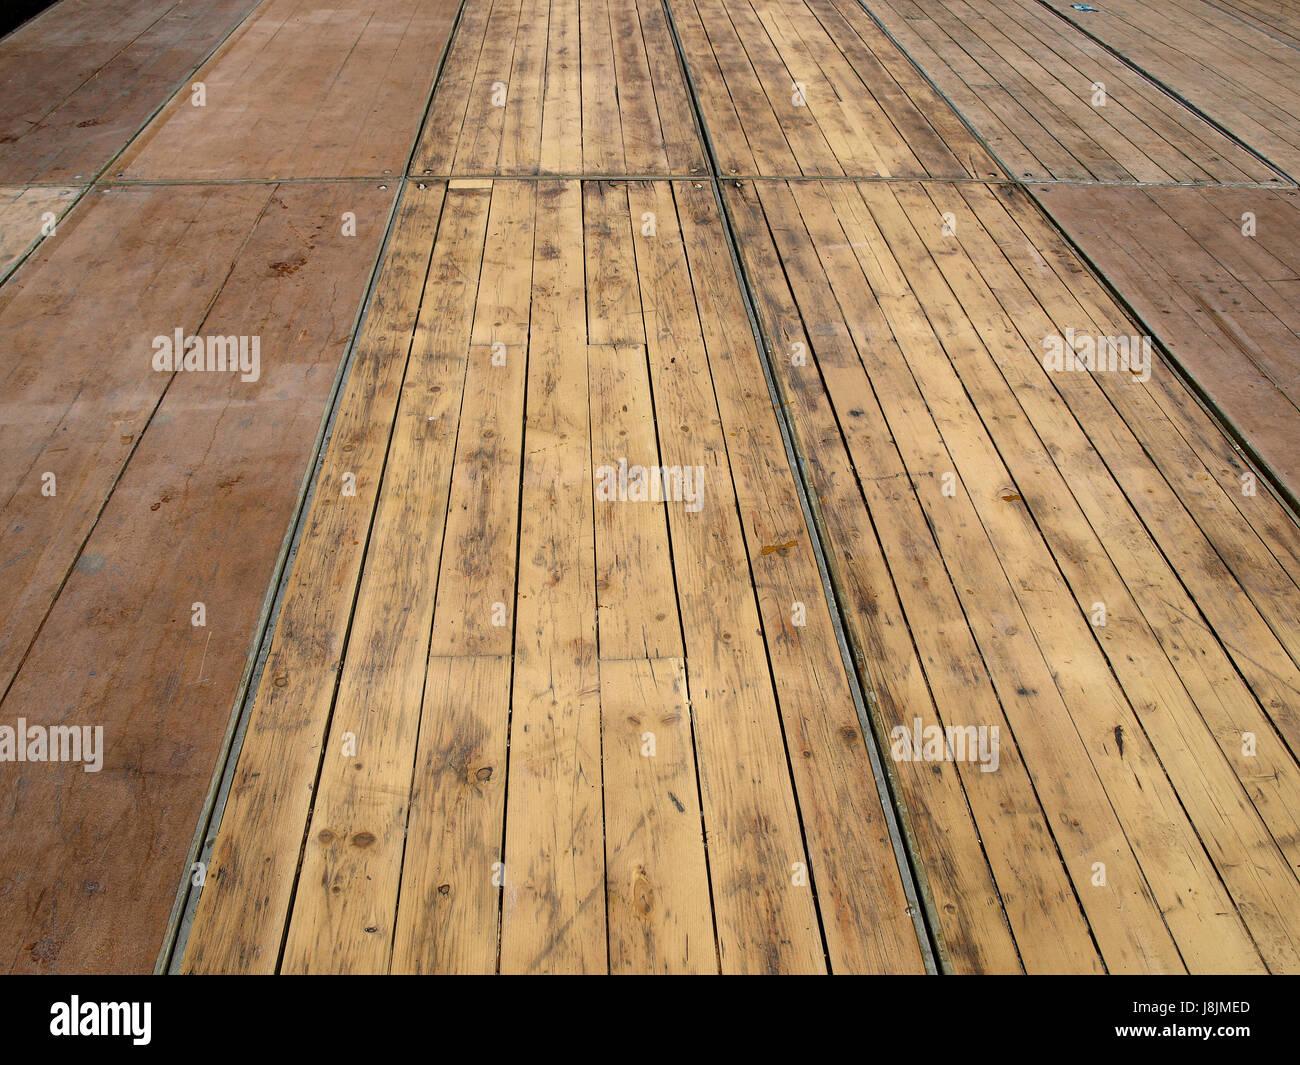 board wood timber plank wooden veneer texture floor board